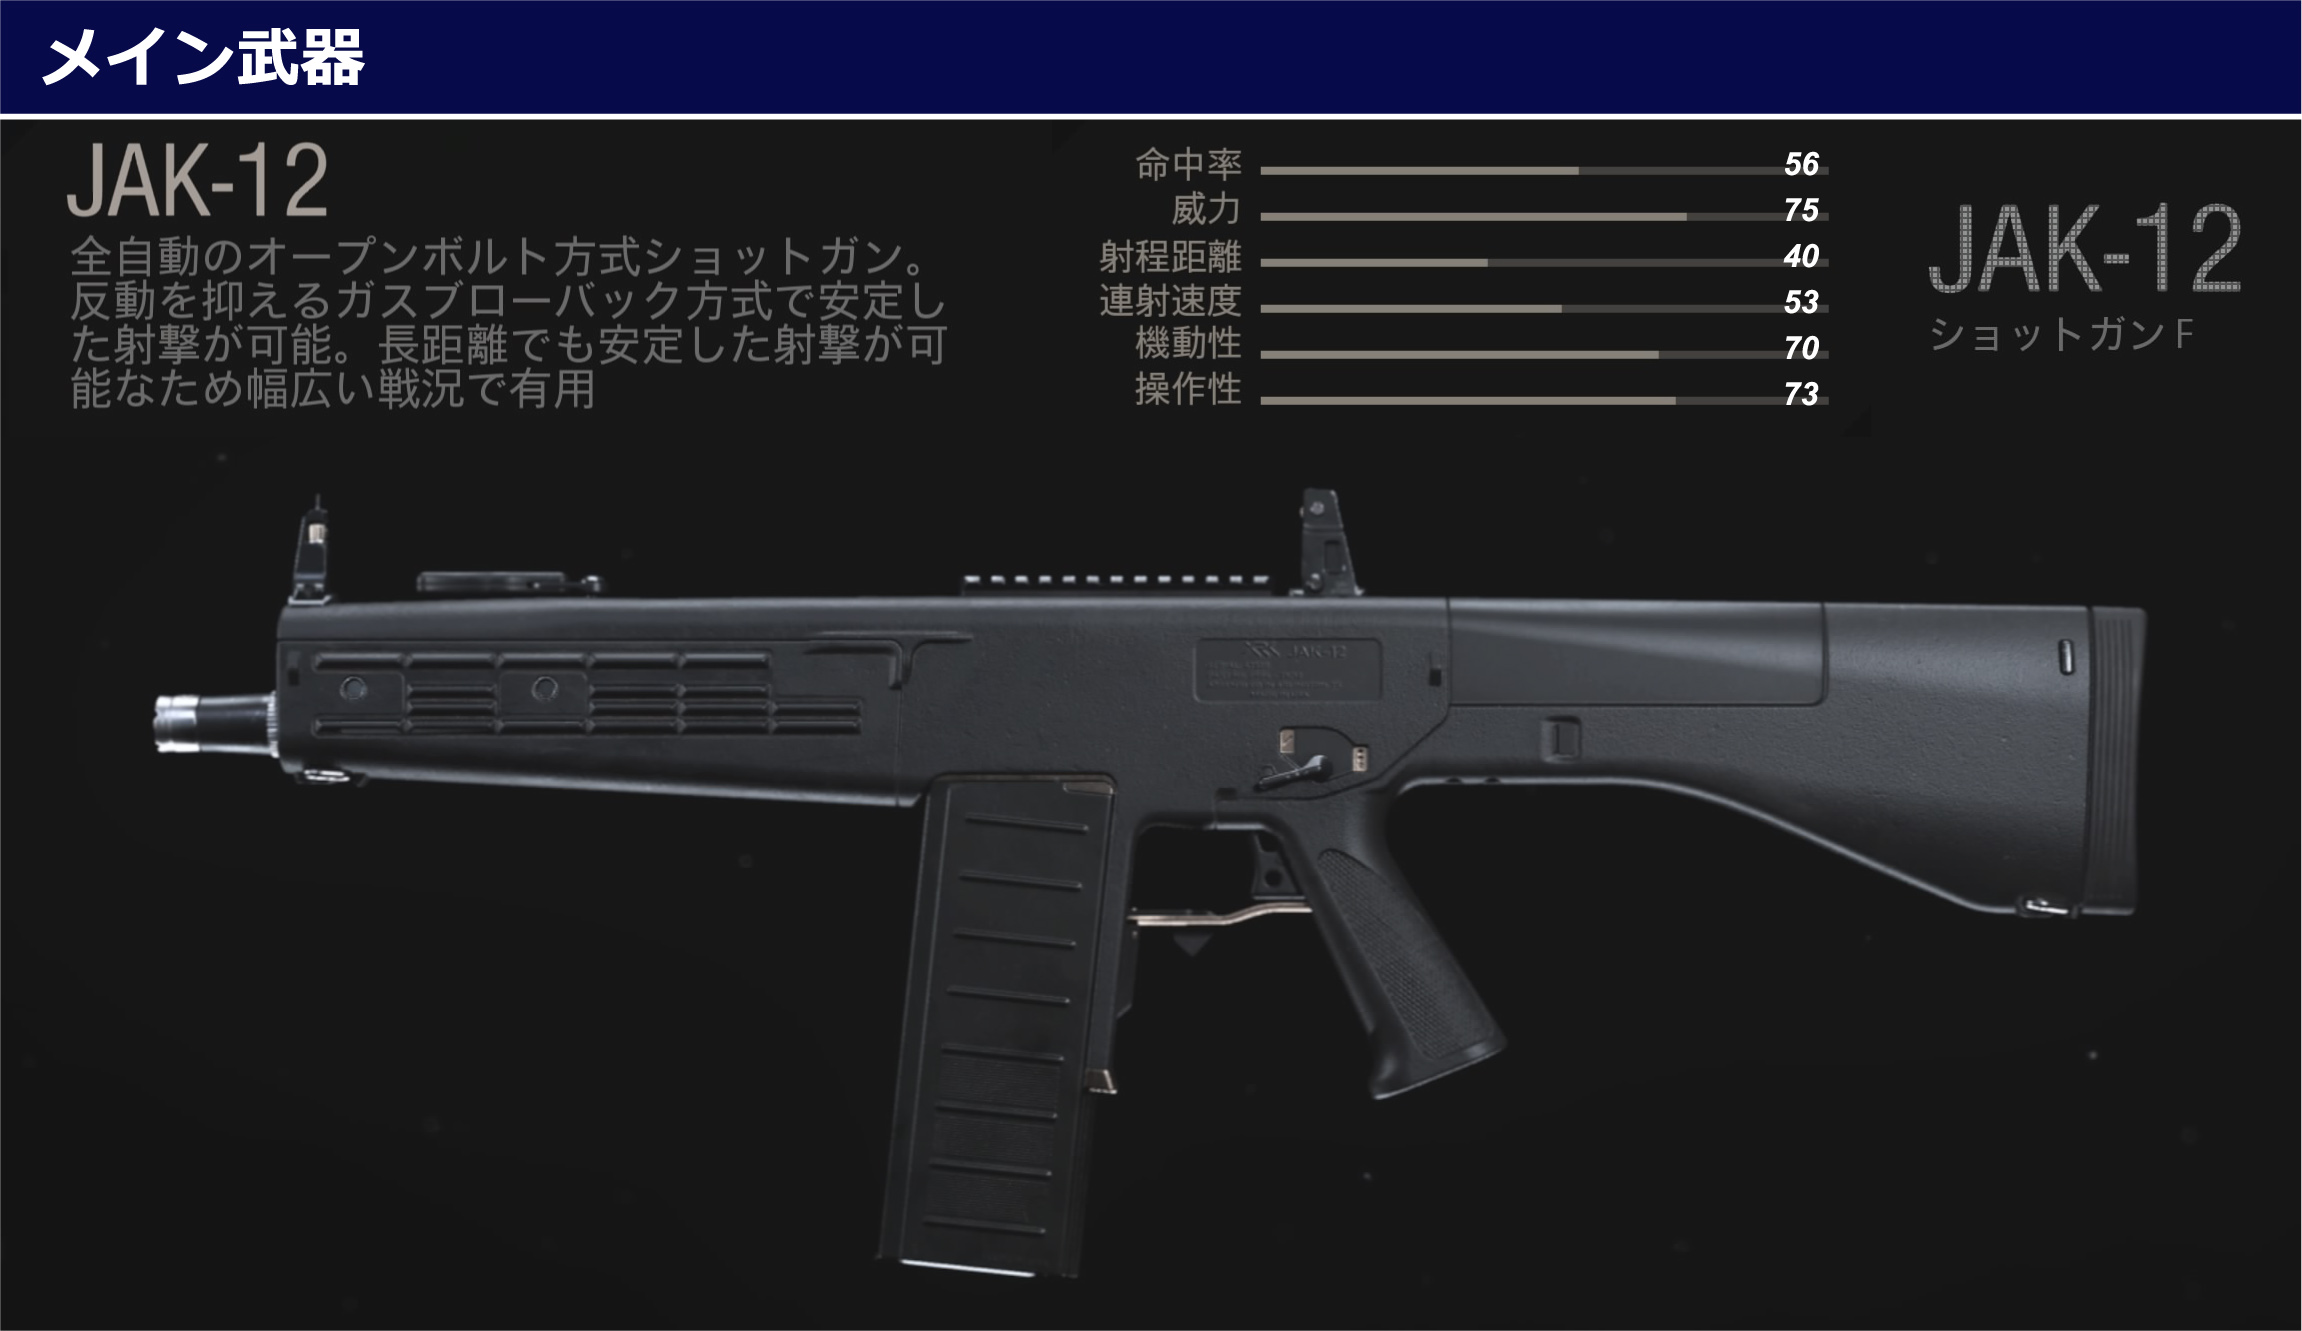 JAK-12